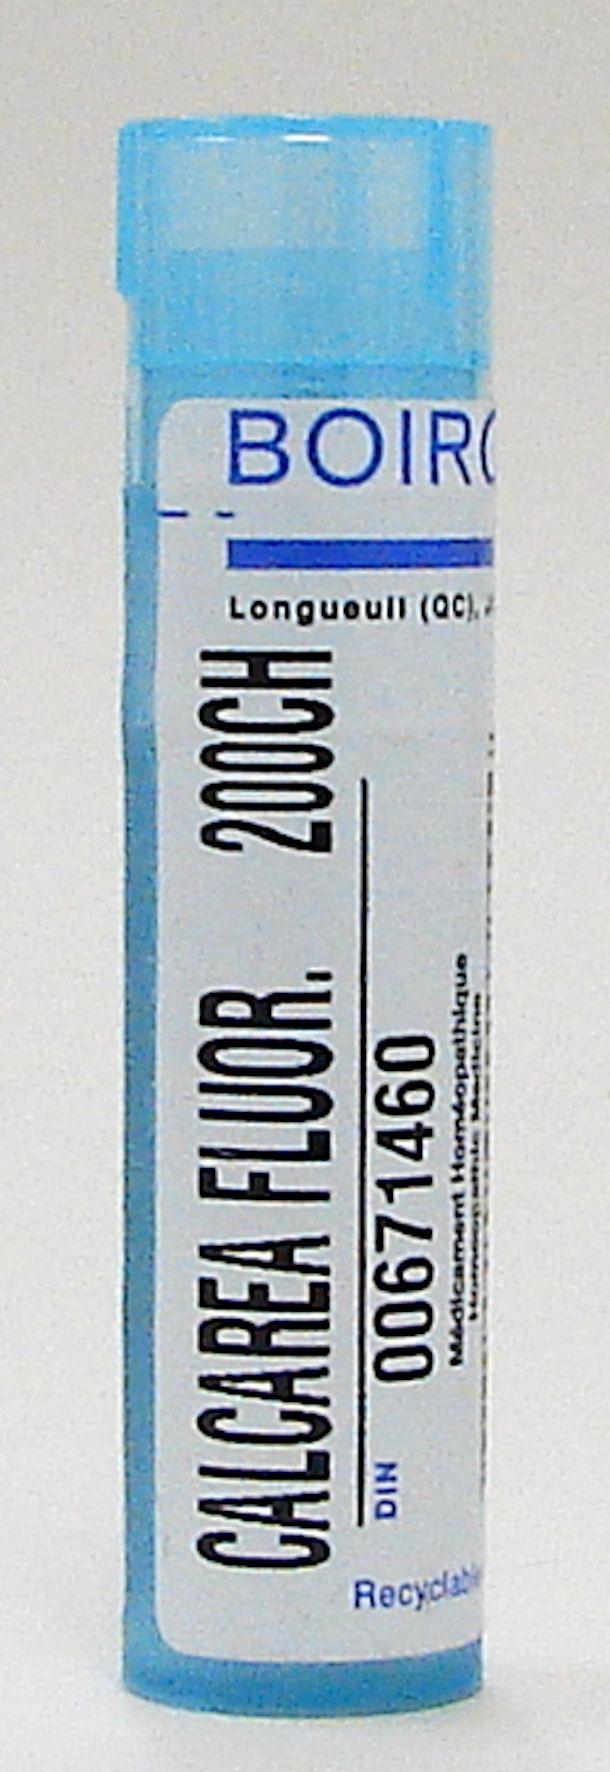 calcarea fluorica 200ch sublingual pellets (boiron)